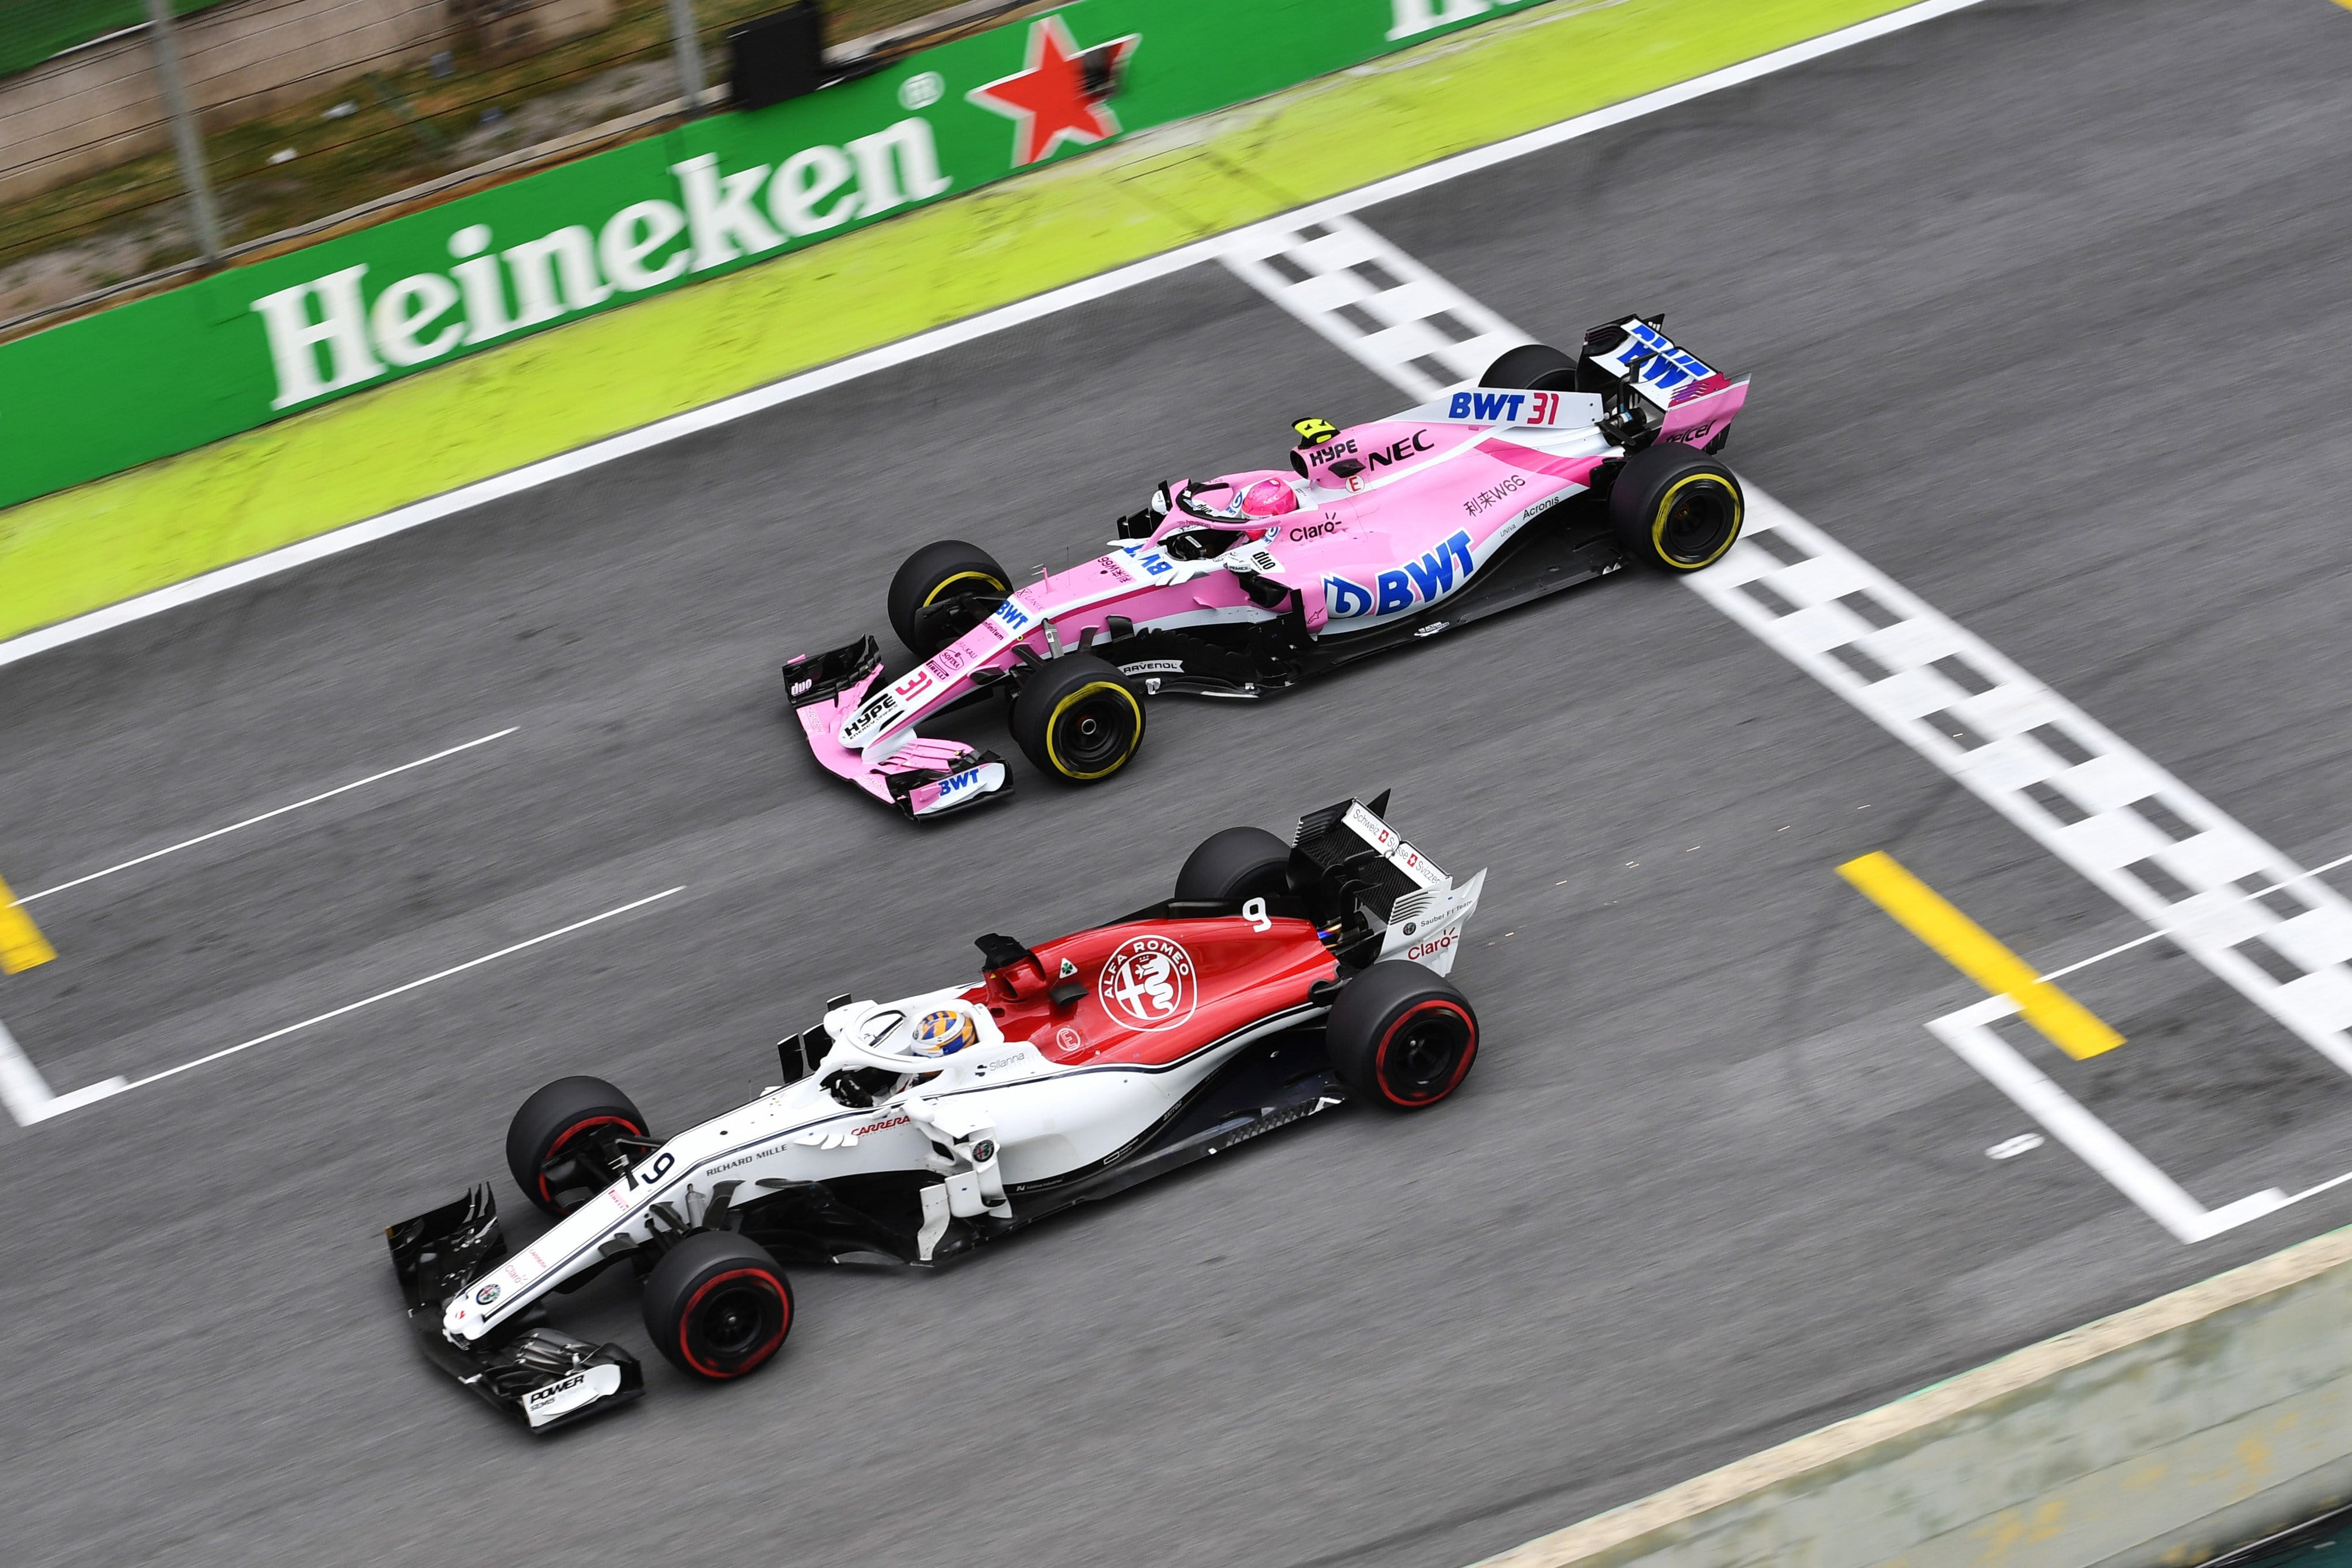 Marcus Ericsson - Alfa Romeo Sauber F1 Team - Brazil GP